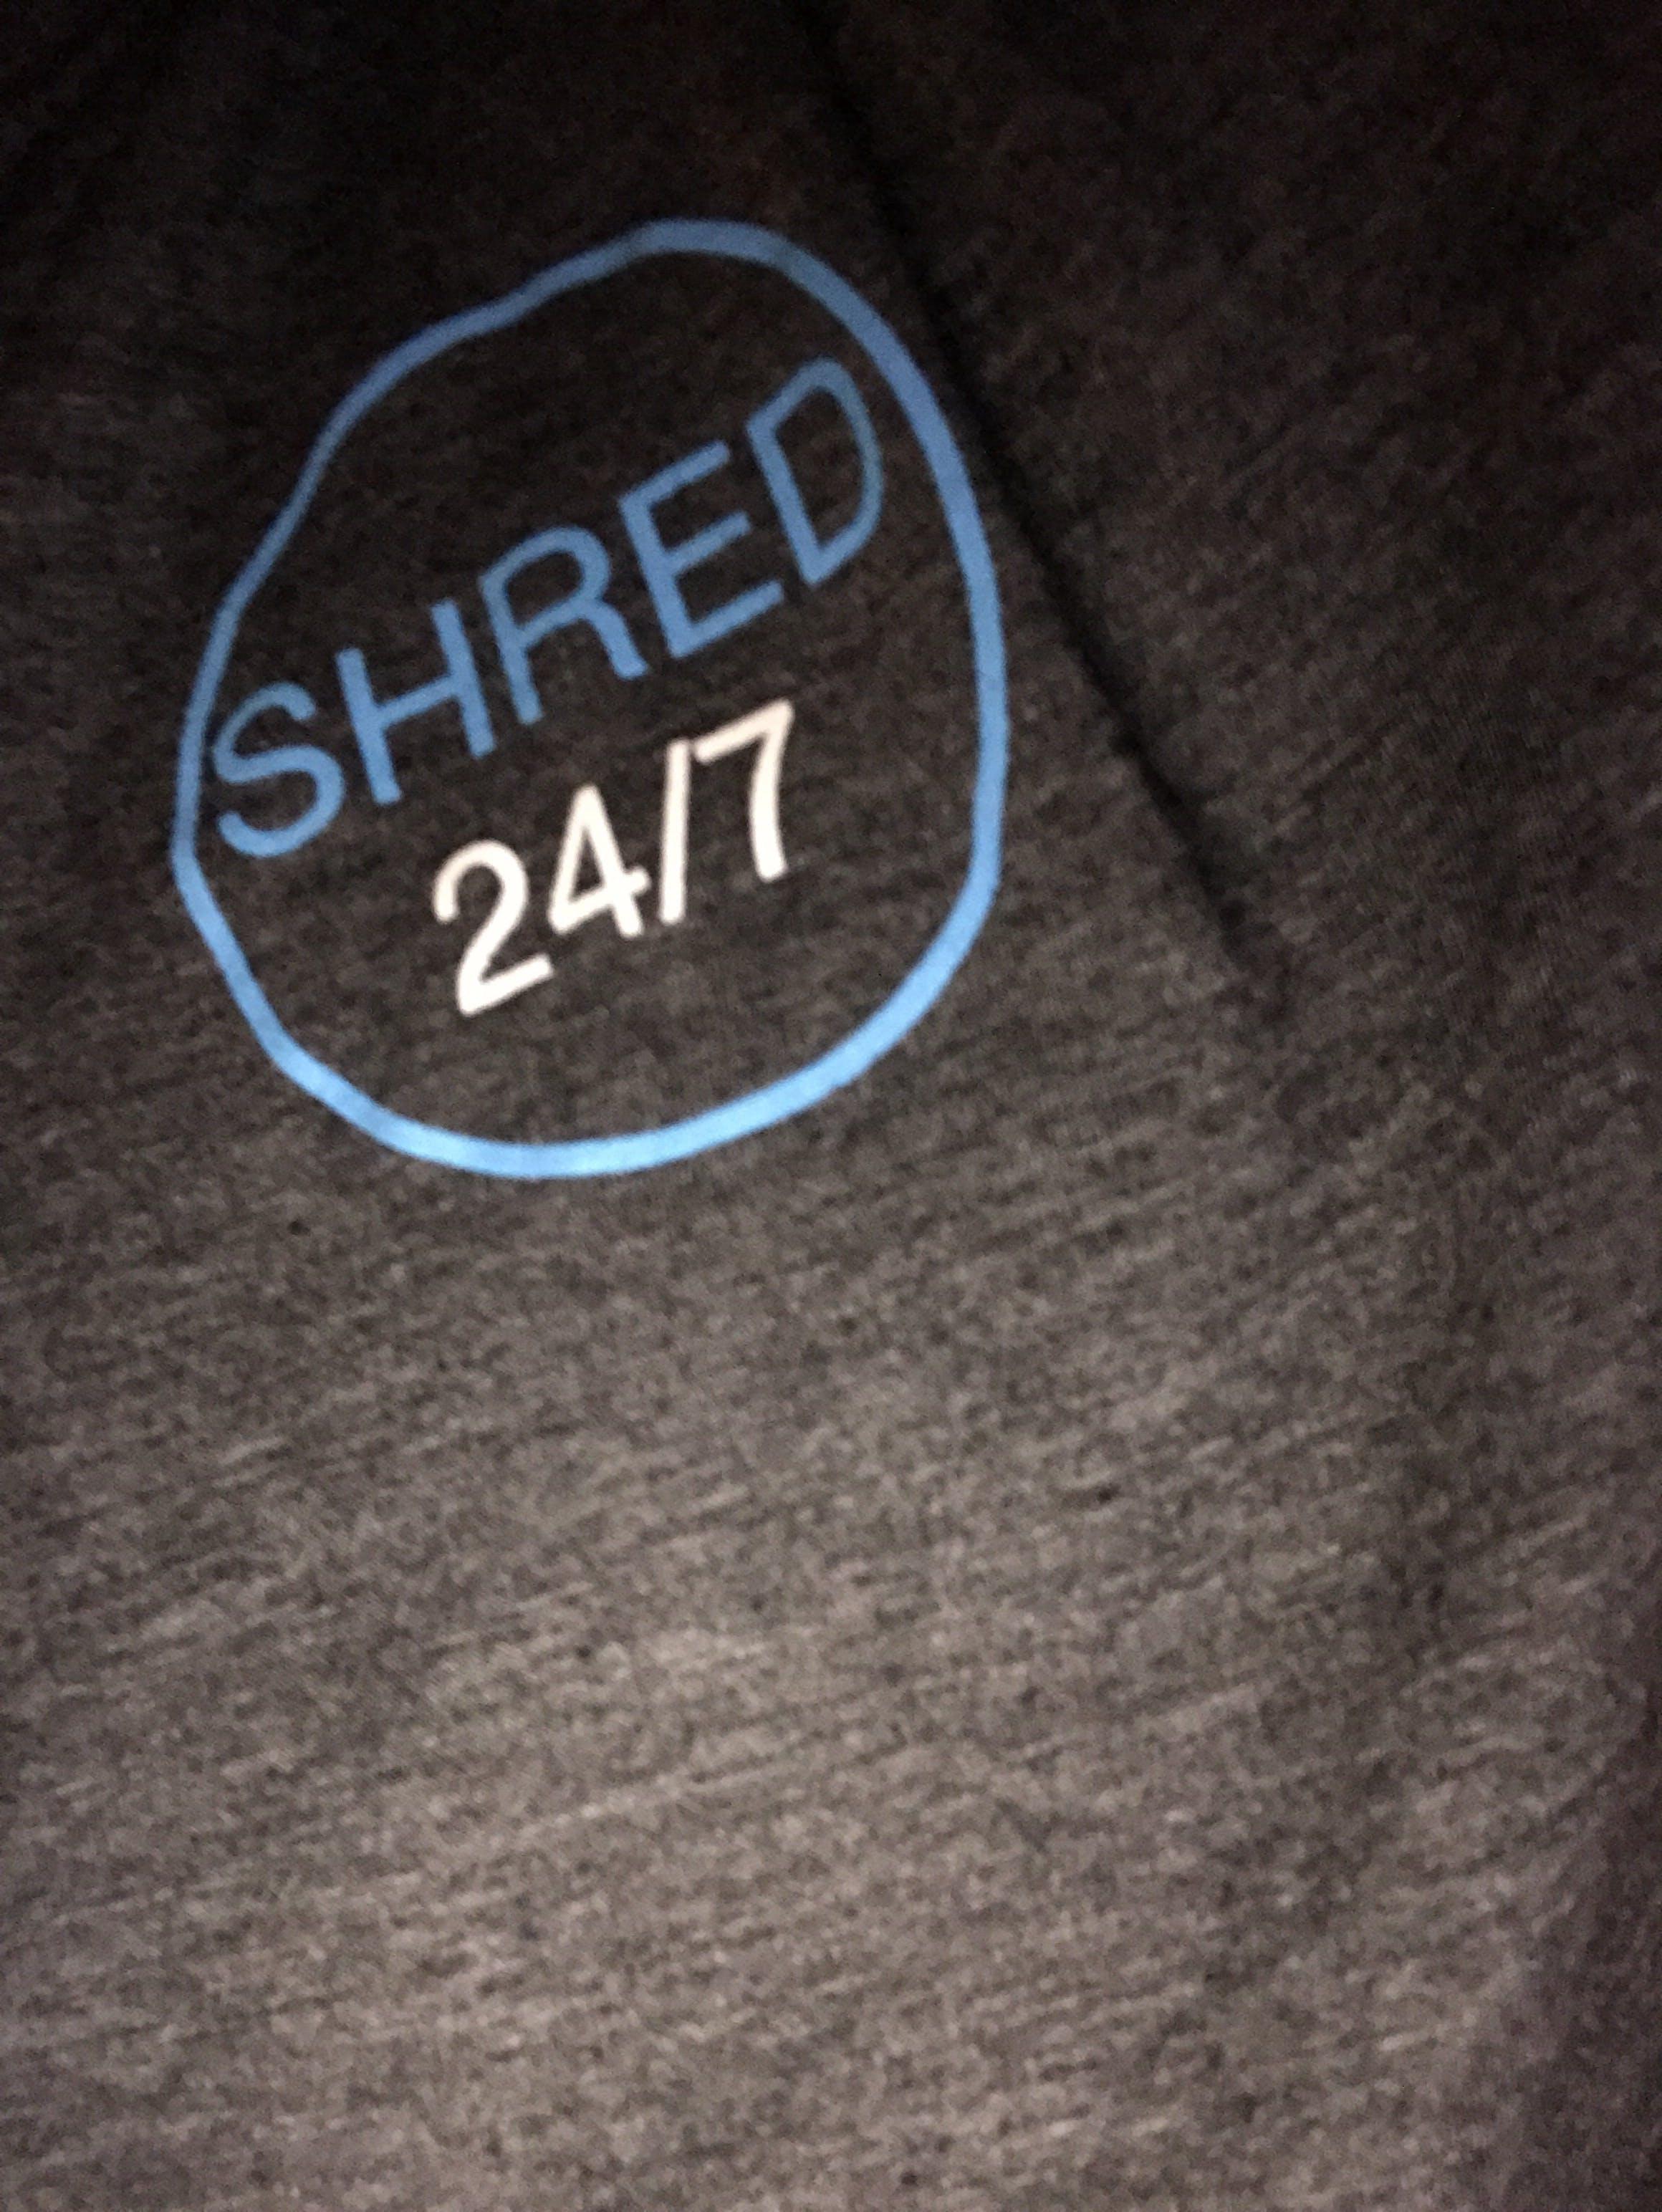 SHRED 24/7 T-SHIRT